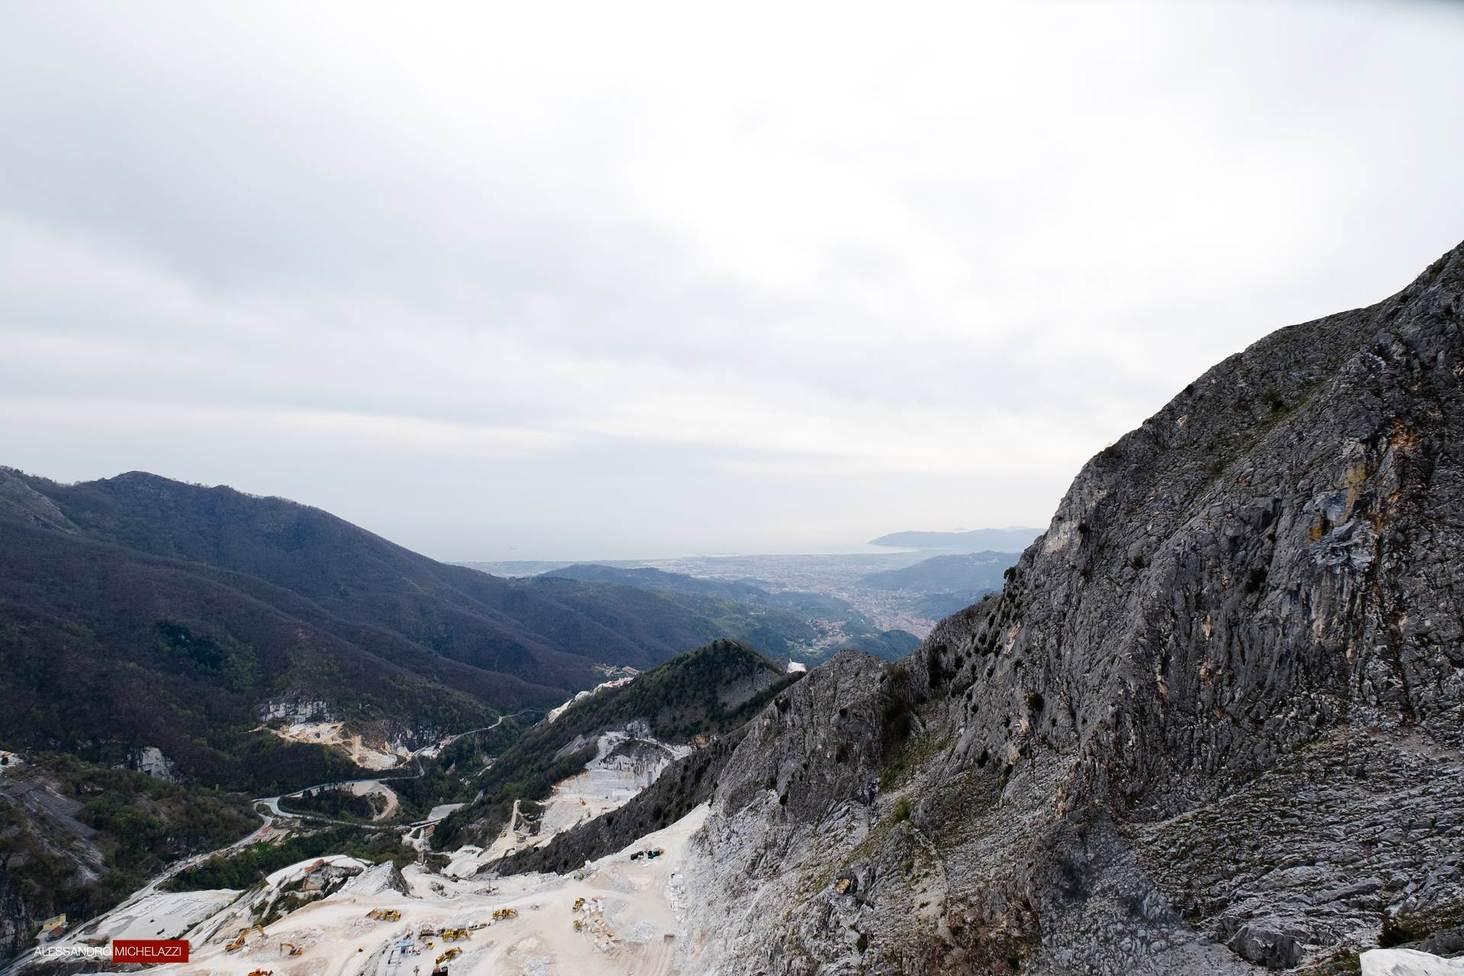 carrara-marble-cave-photos-12